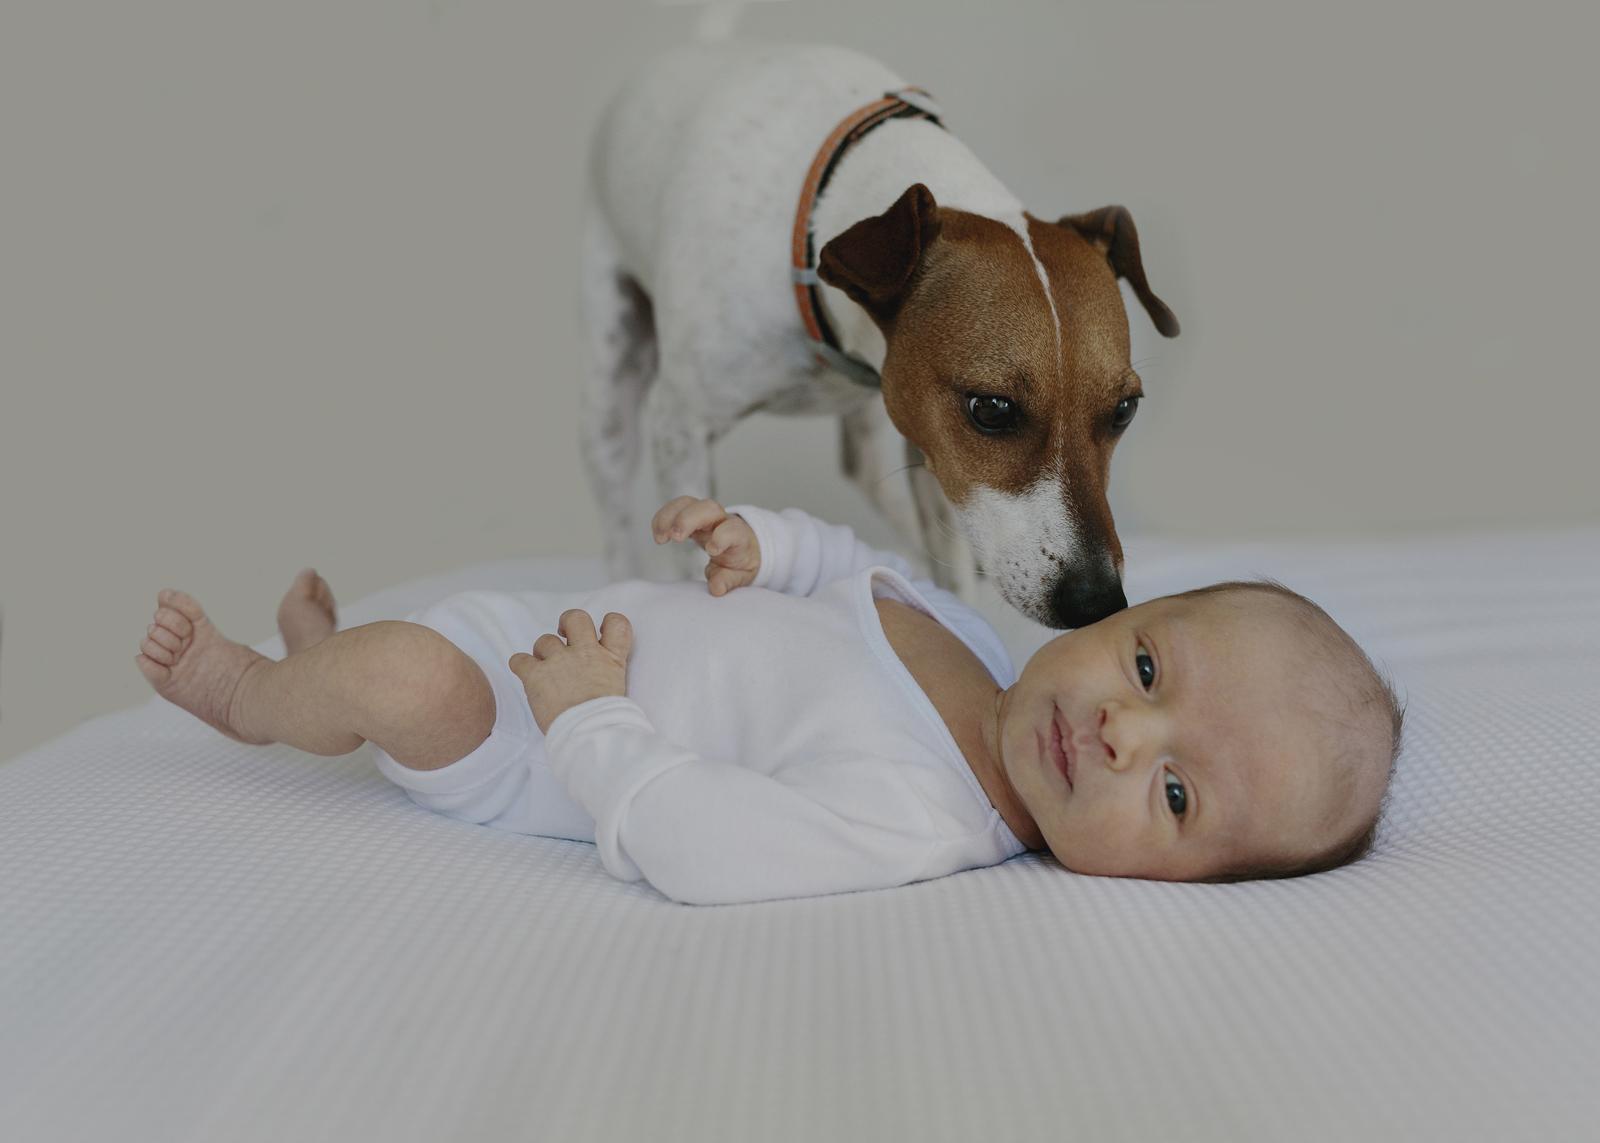 Family dog wondering who this newborn baby is